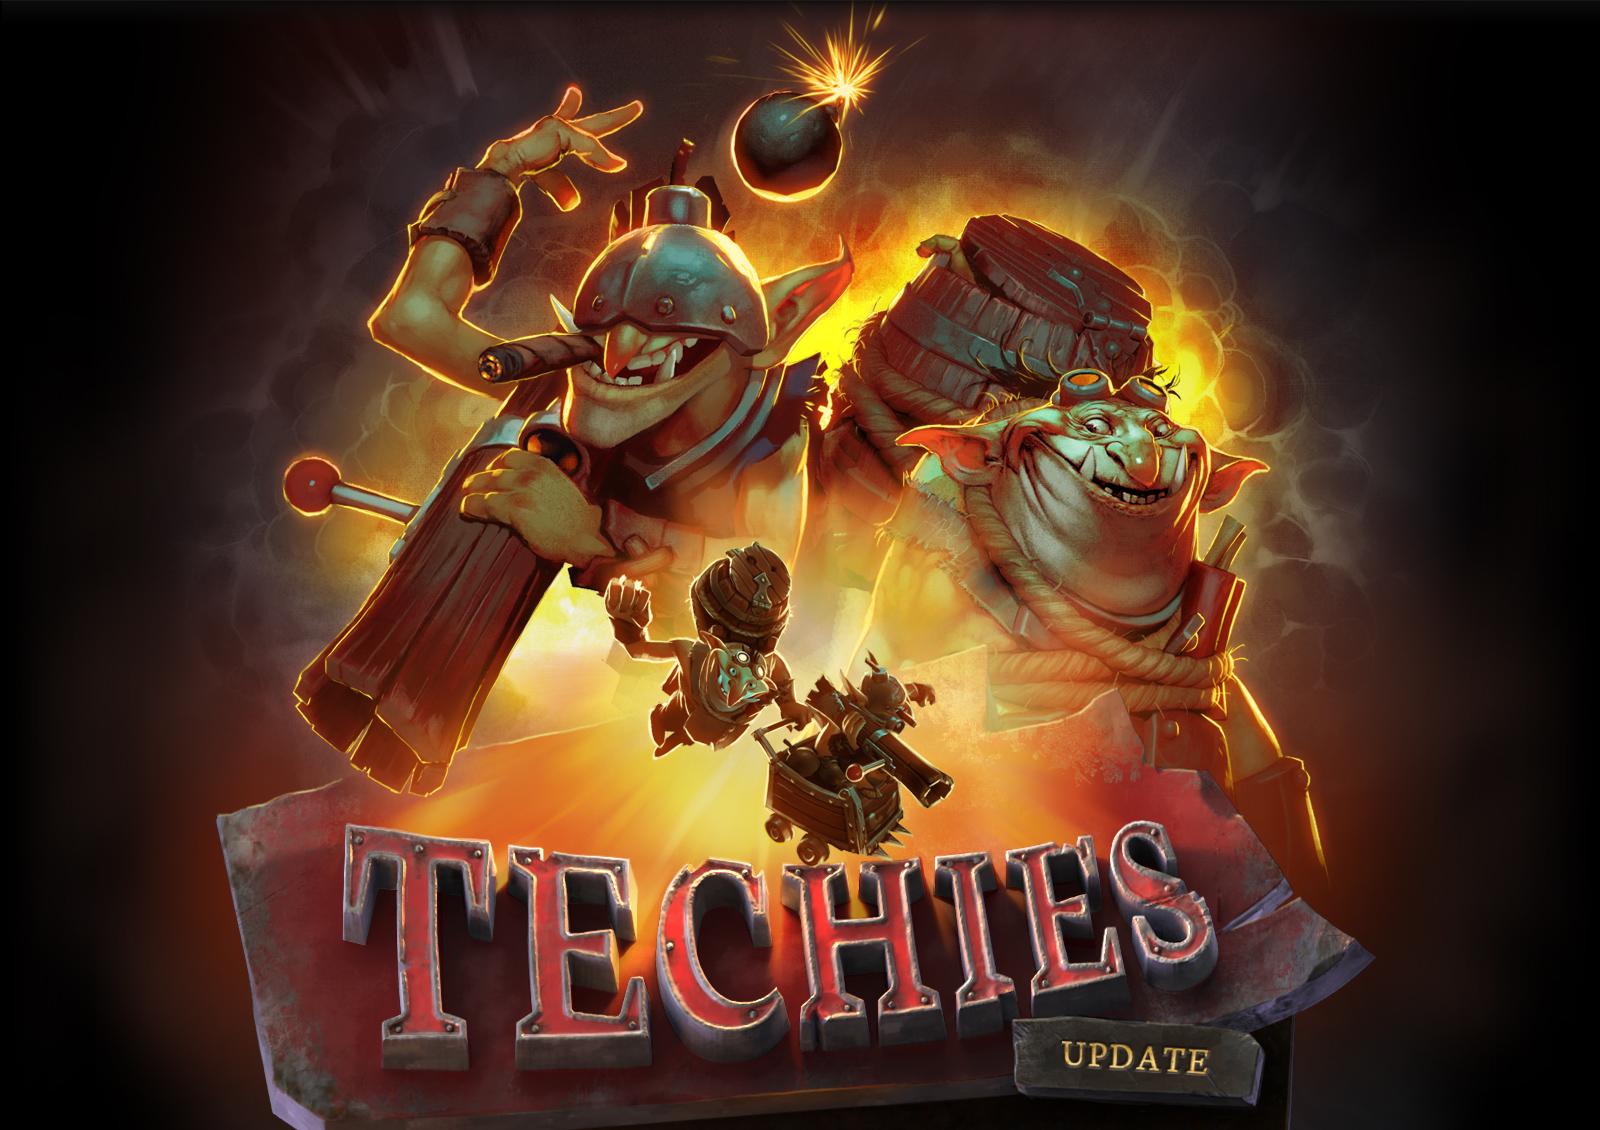 techies_logo